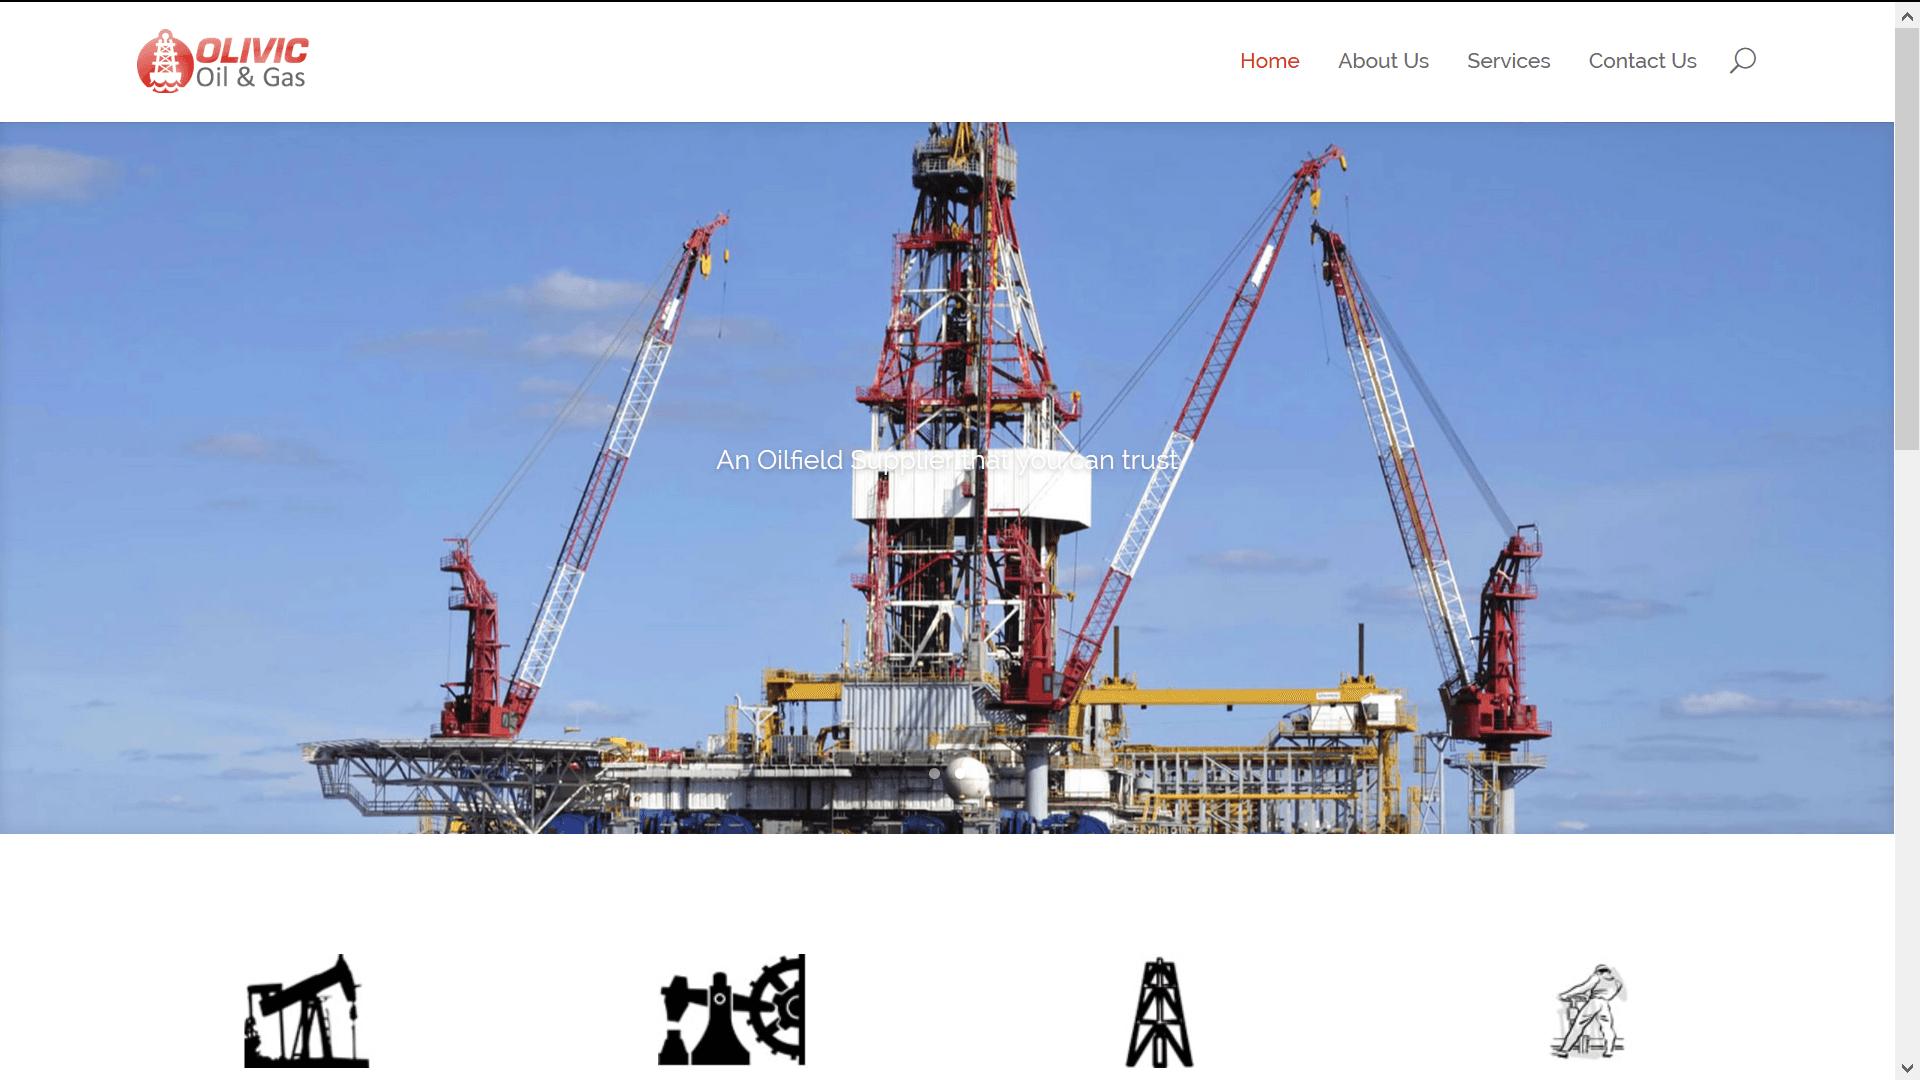 Olivic Oil & Gas Ltd